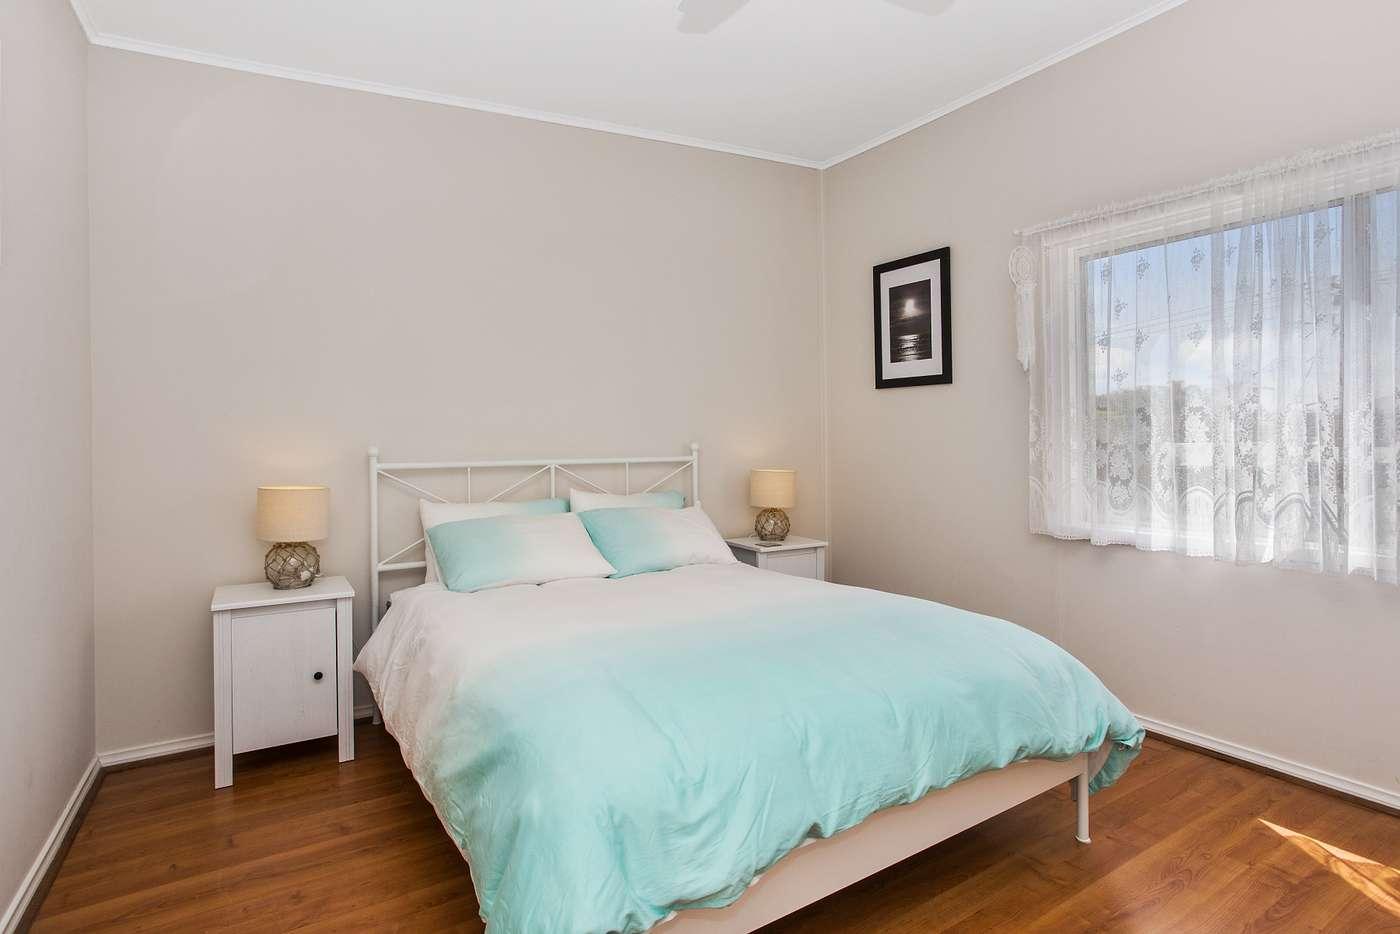 Seventh view of Homely house listing, 38 Coolangatta Drive, Aldinga Beach SA 5173